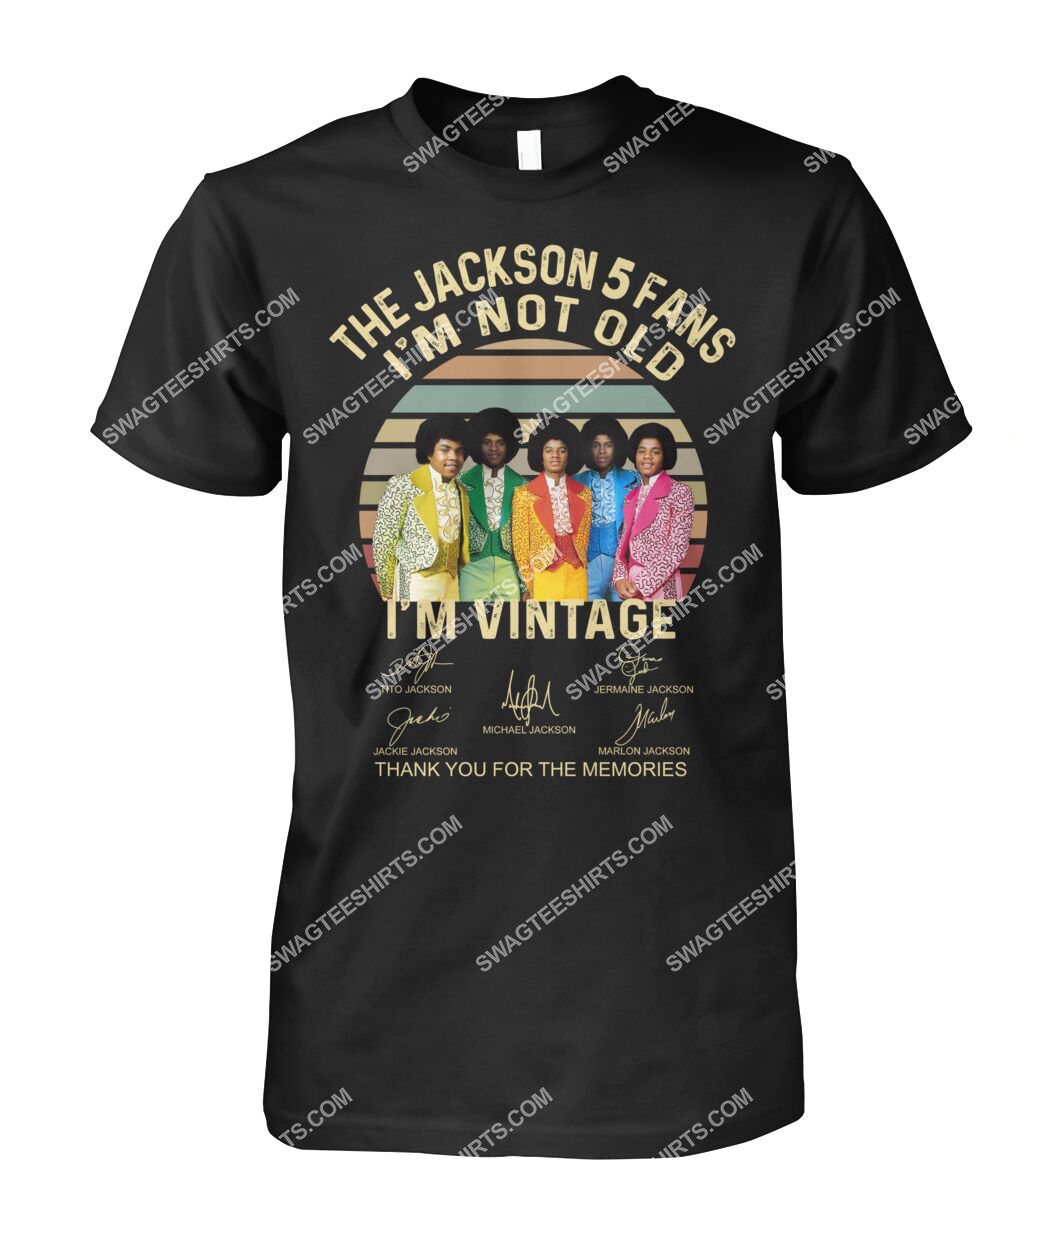 the jackson 5 fans i'm not old i'm vintage tshirt 1